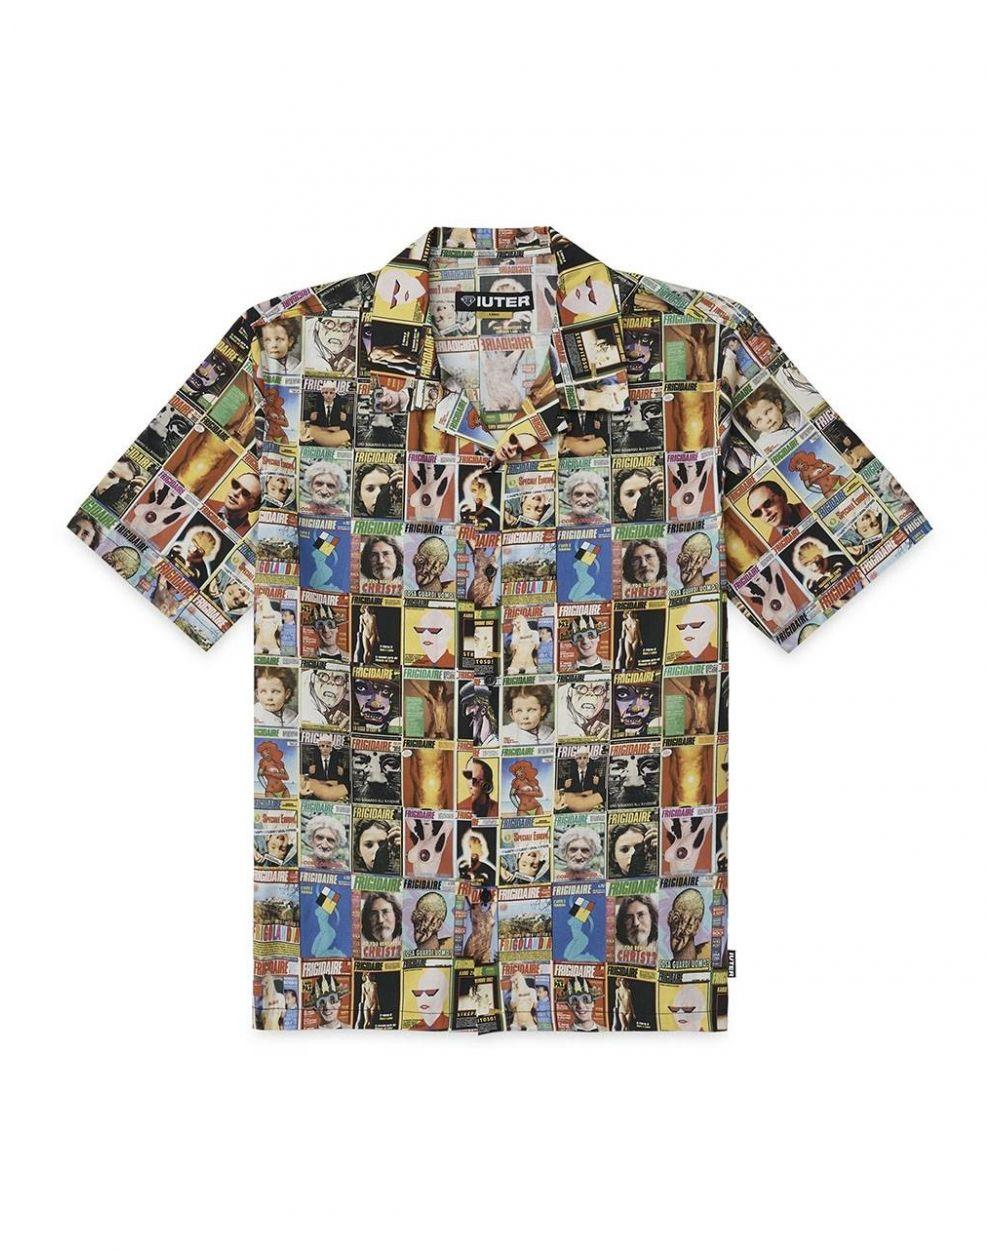 Iuter Frigidaire cover cuban shirt - multicolor IUTER Shirt 102,00€